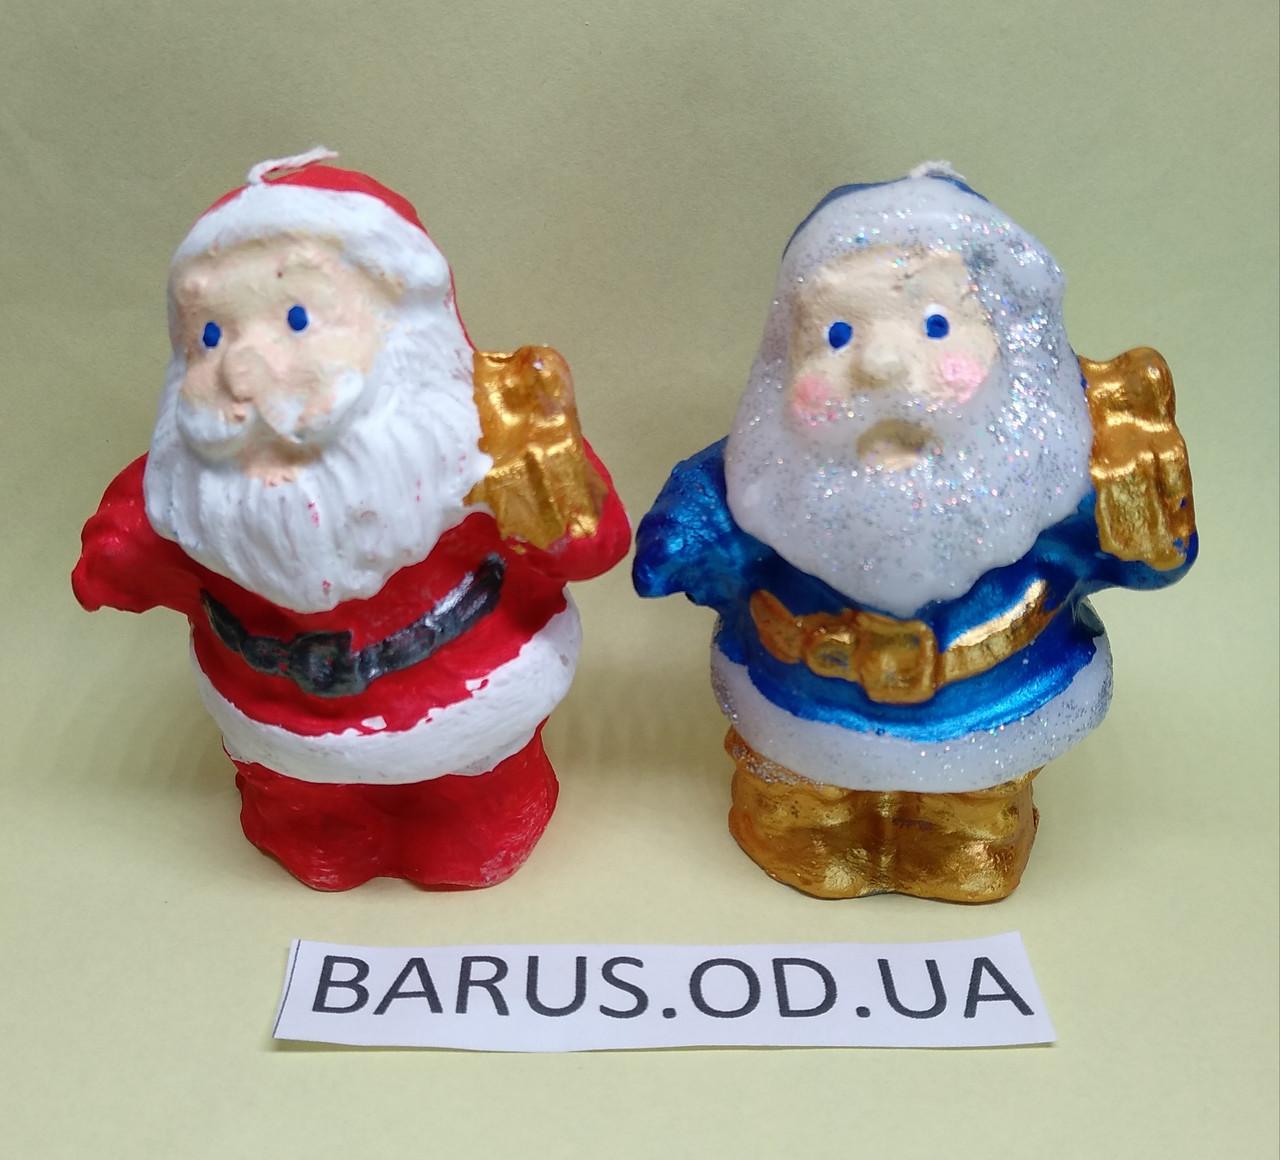 w640 h640 svechi dekorativnye santa